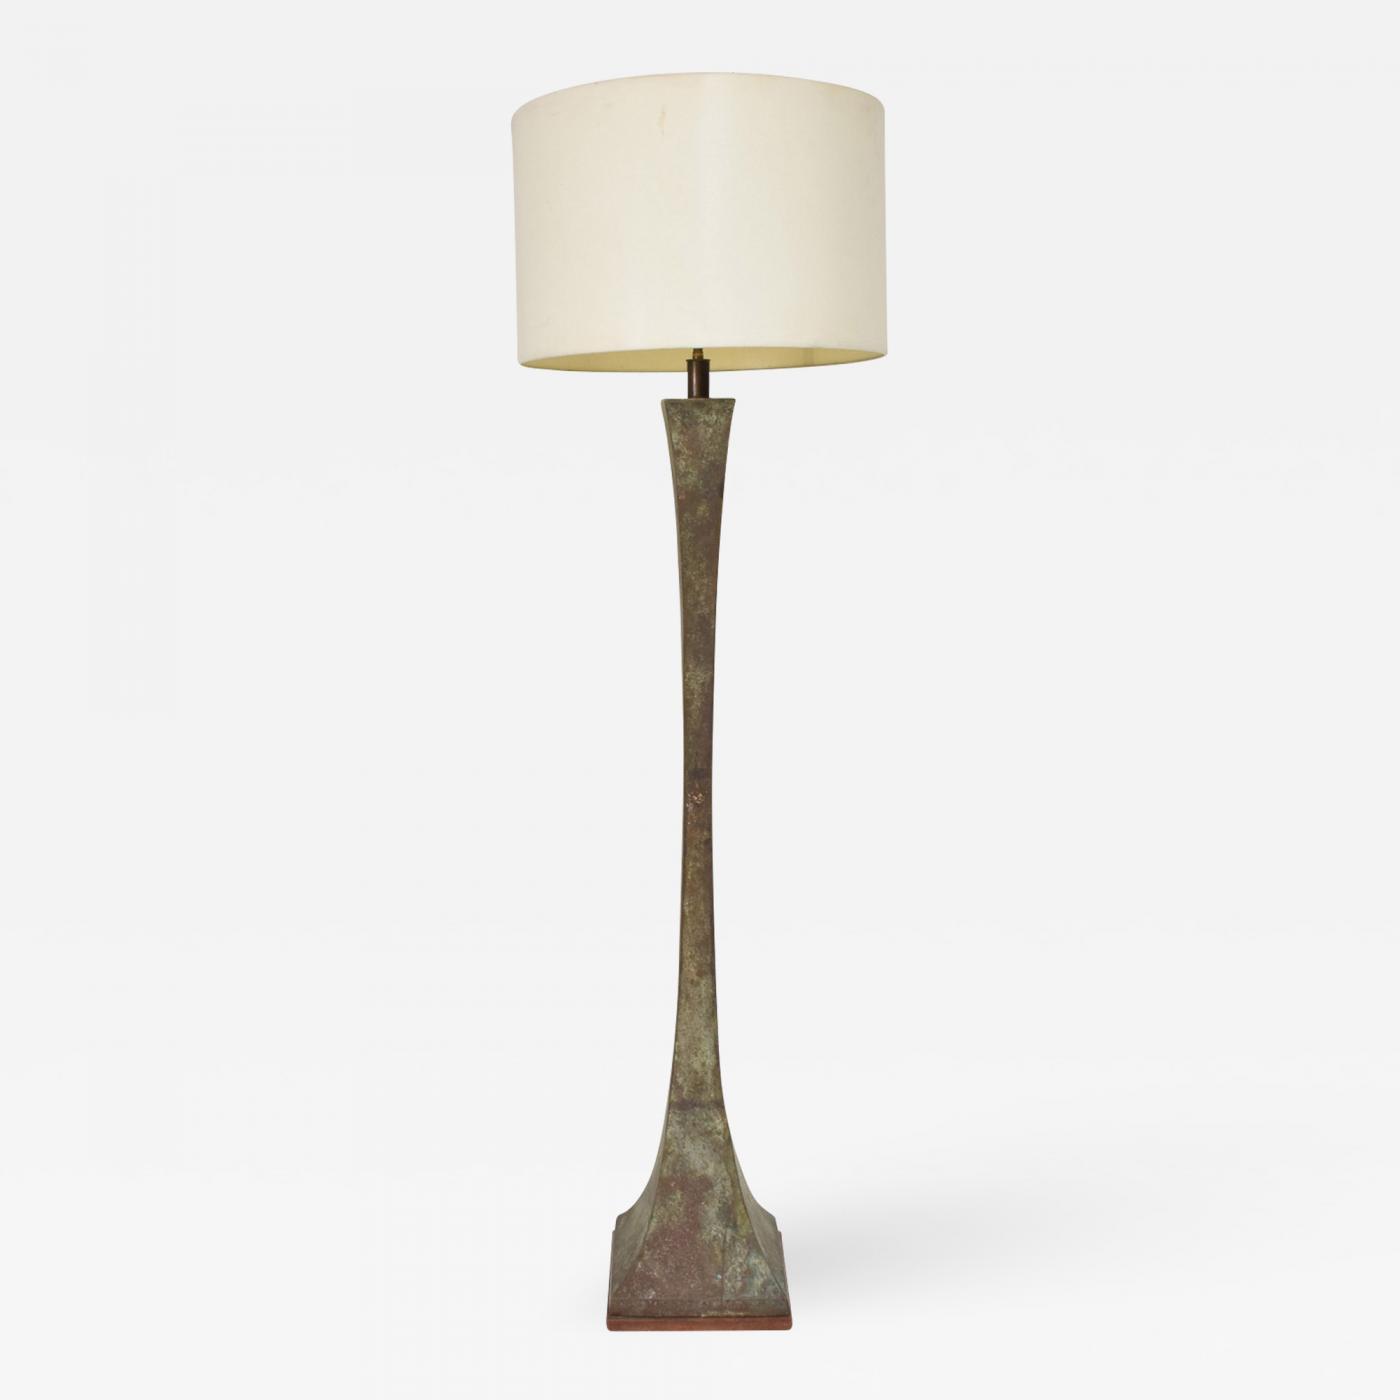 Image of: Stewart Ross James Mid Century Modern Bronze Floor Lamp With Verdigris Patina Stewart Ross Hansen